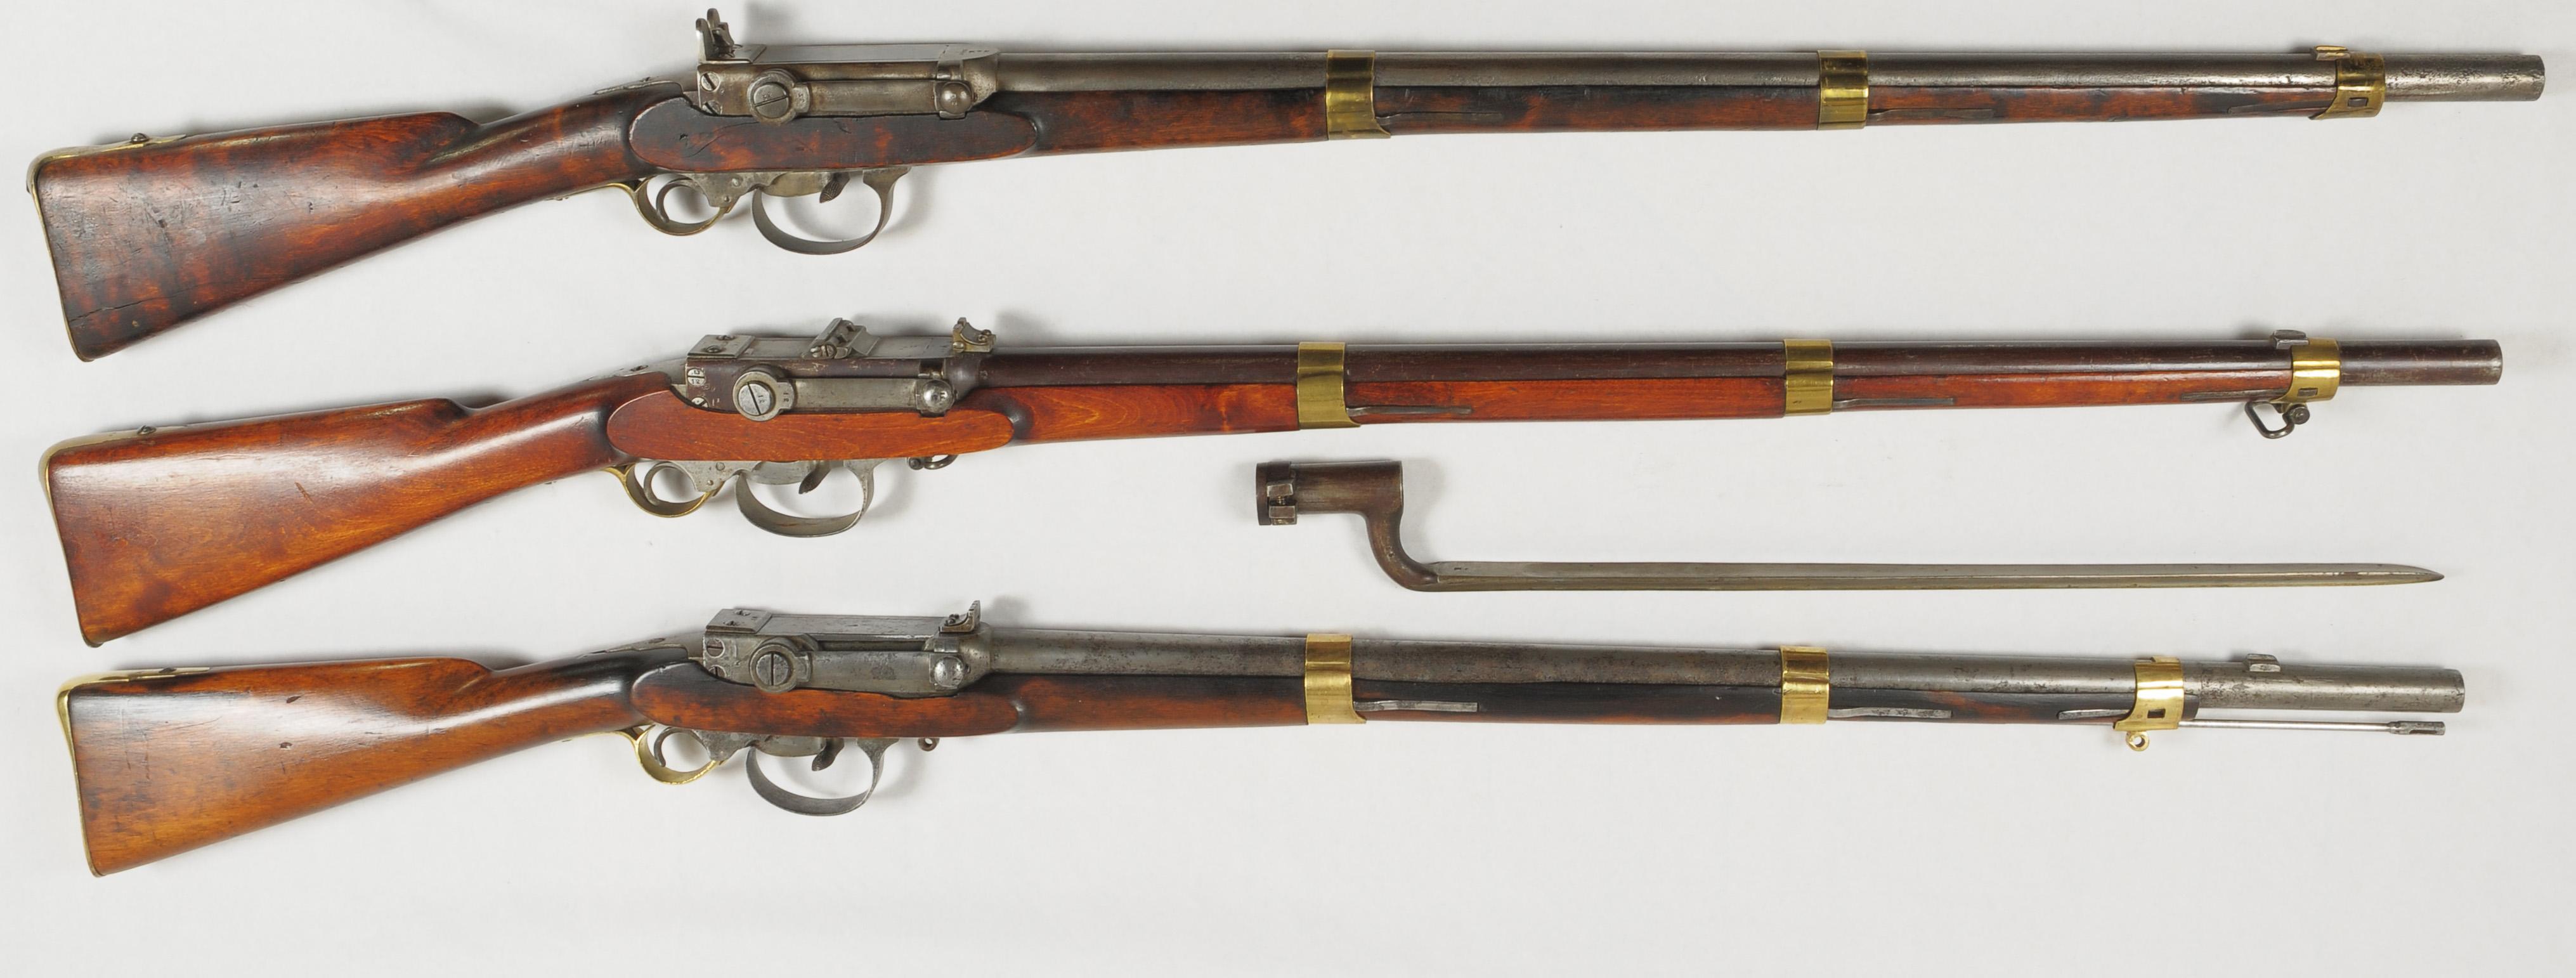 Rifle-Kongsberg-Kammerlader-M1845-M1845-